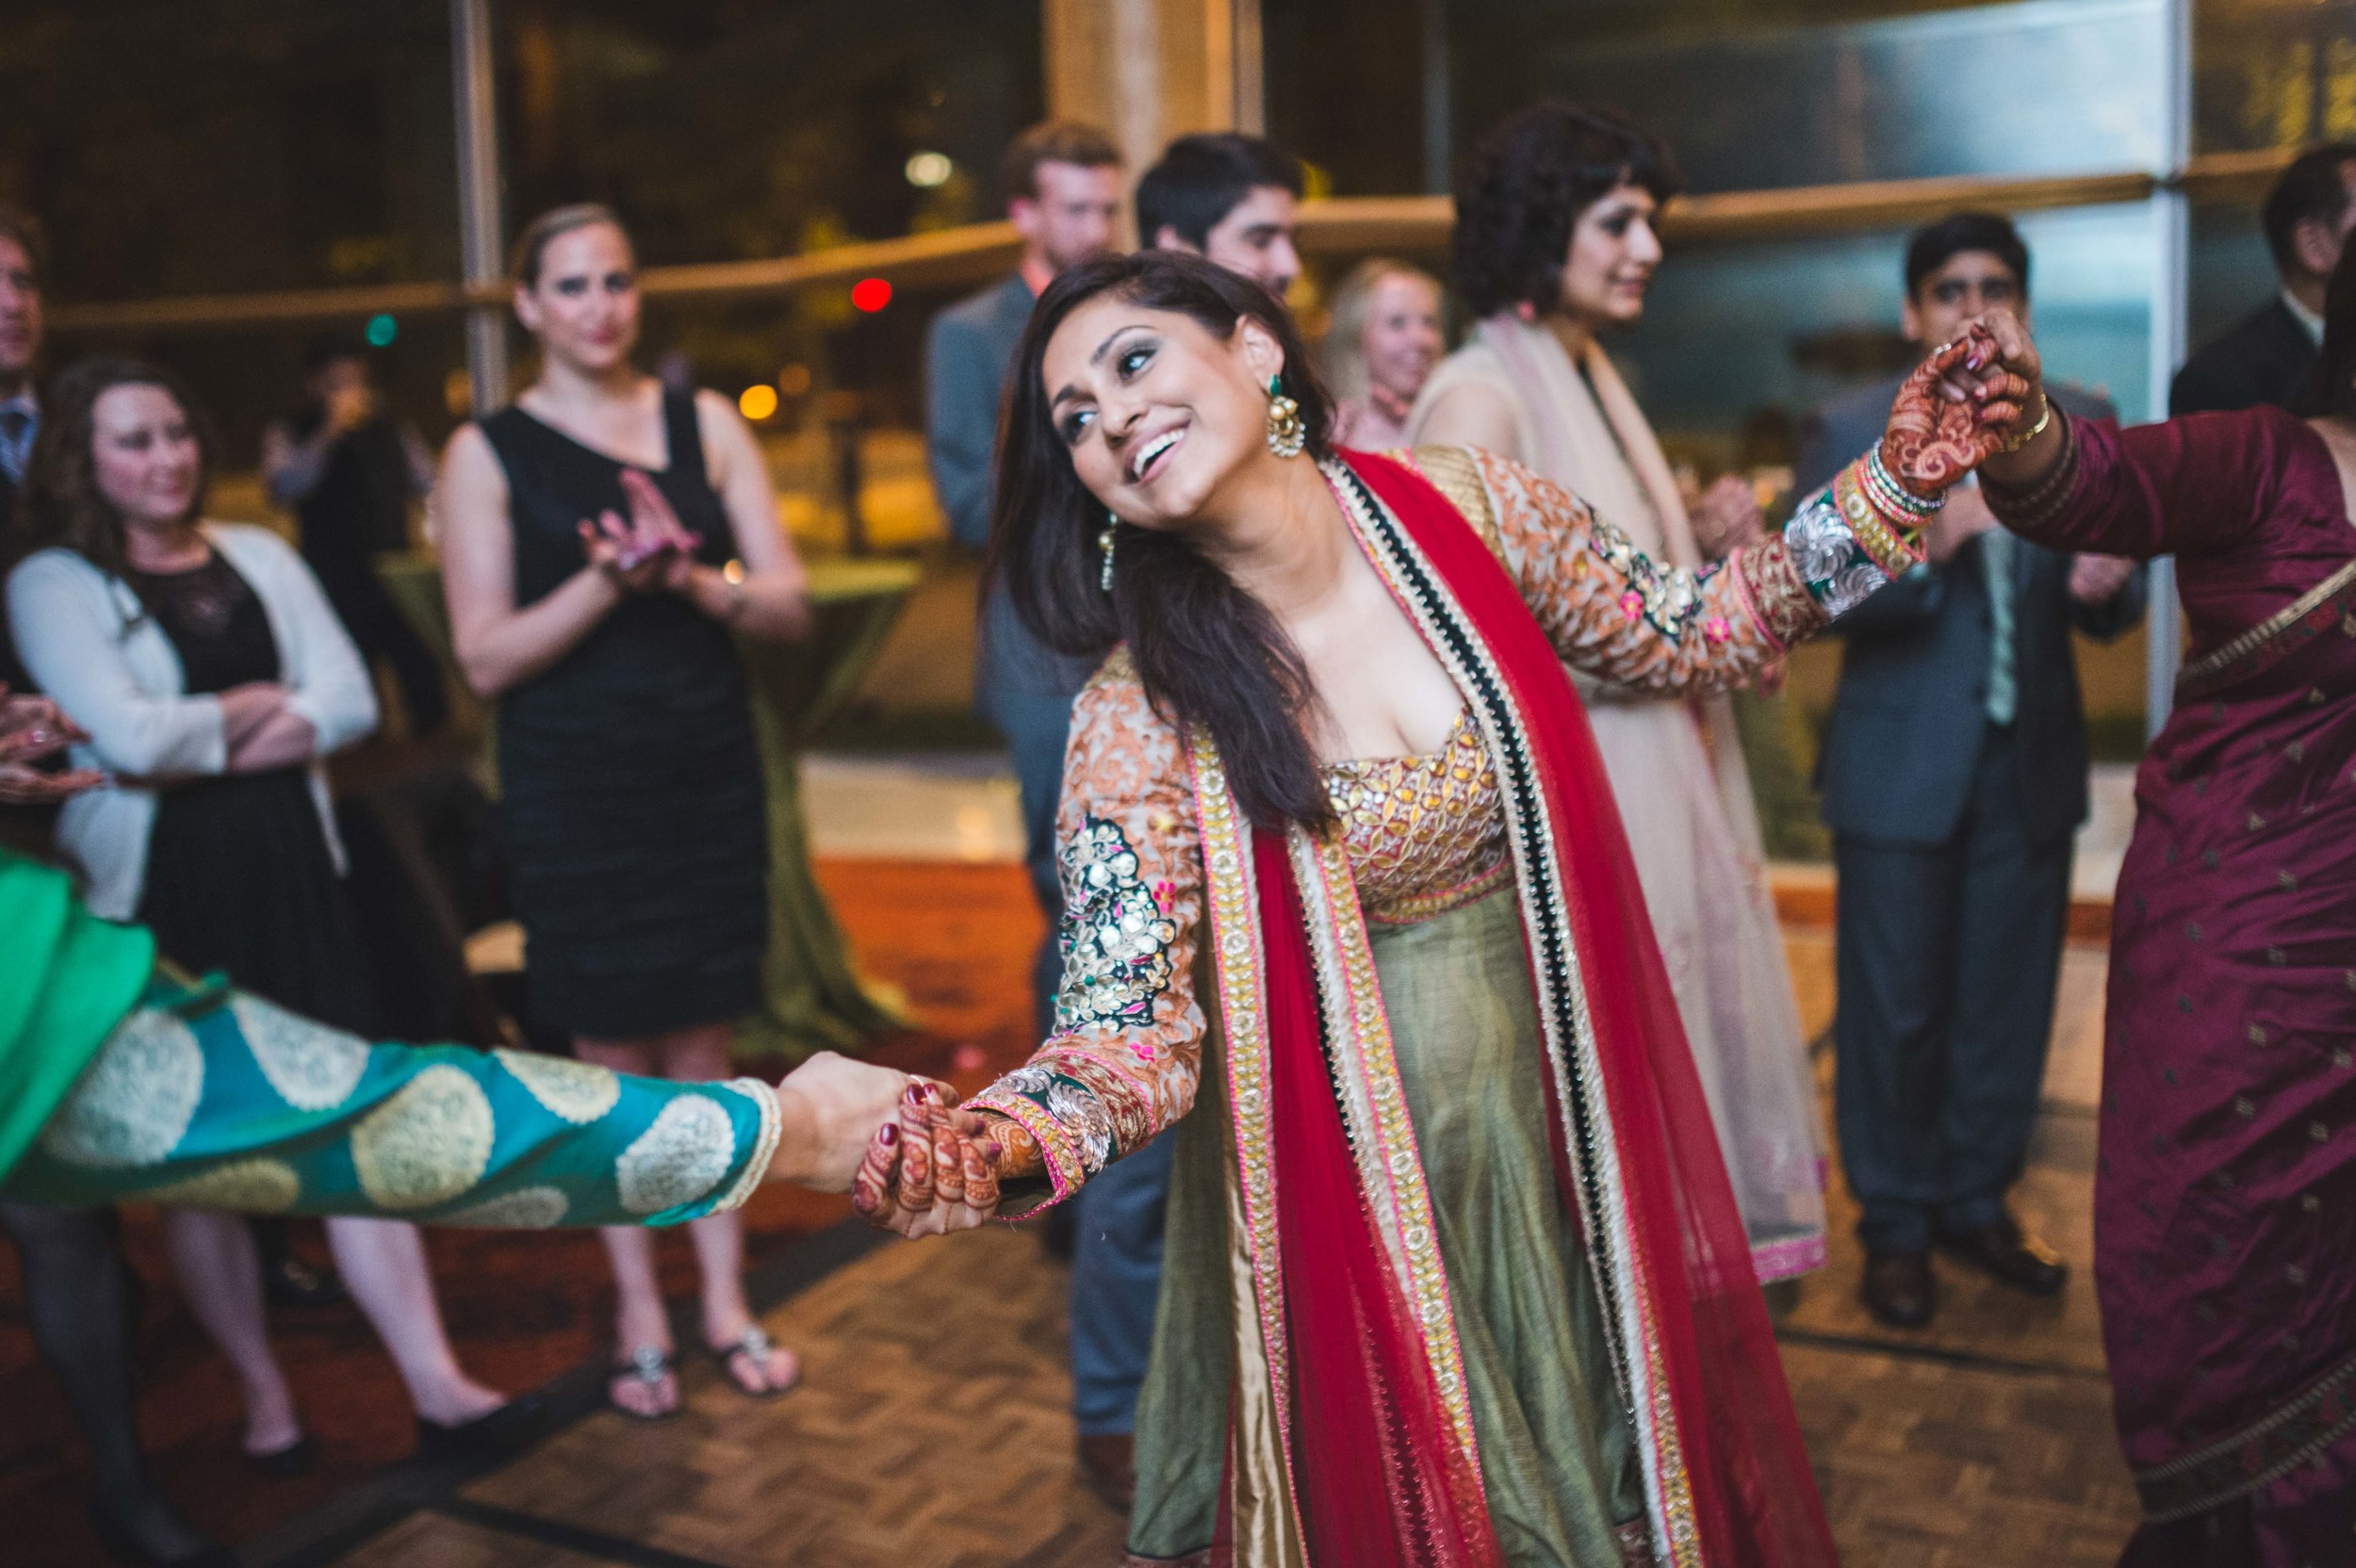 Indian Pre-wedding  at Arena Stage Washington DC by Mantas Kubilinskas-31.jpg